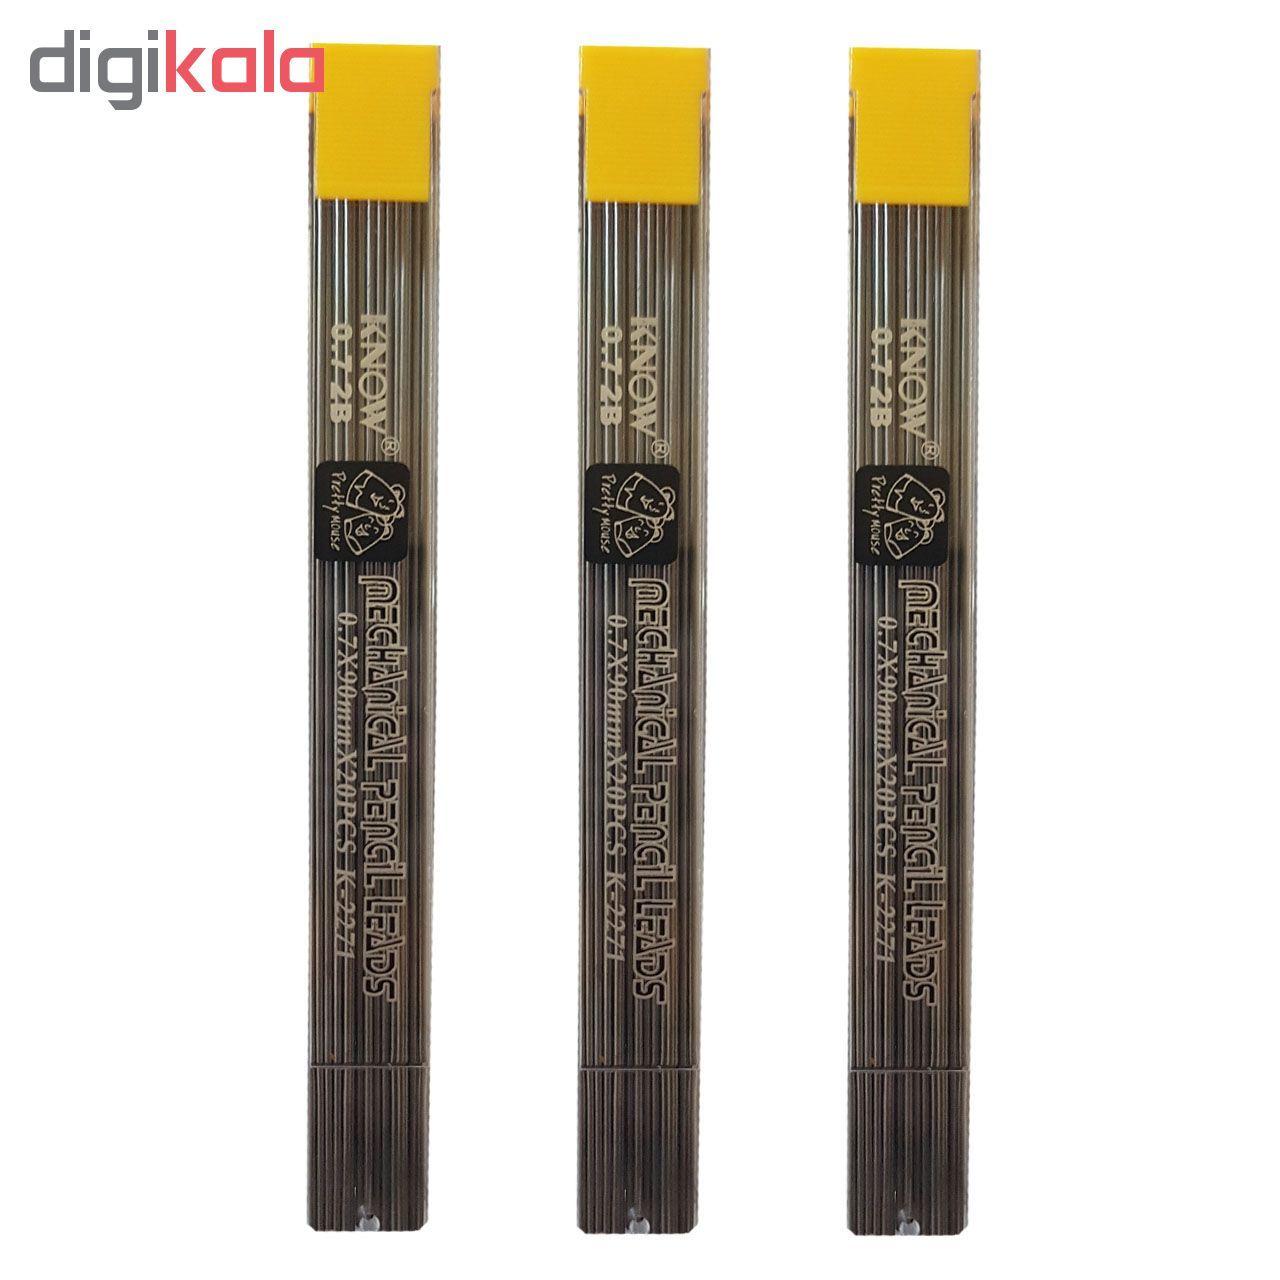 نوک مداد نوکی 0.7 میلی متری نو کد K-2271 بسته 3 عددی main 1 2